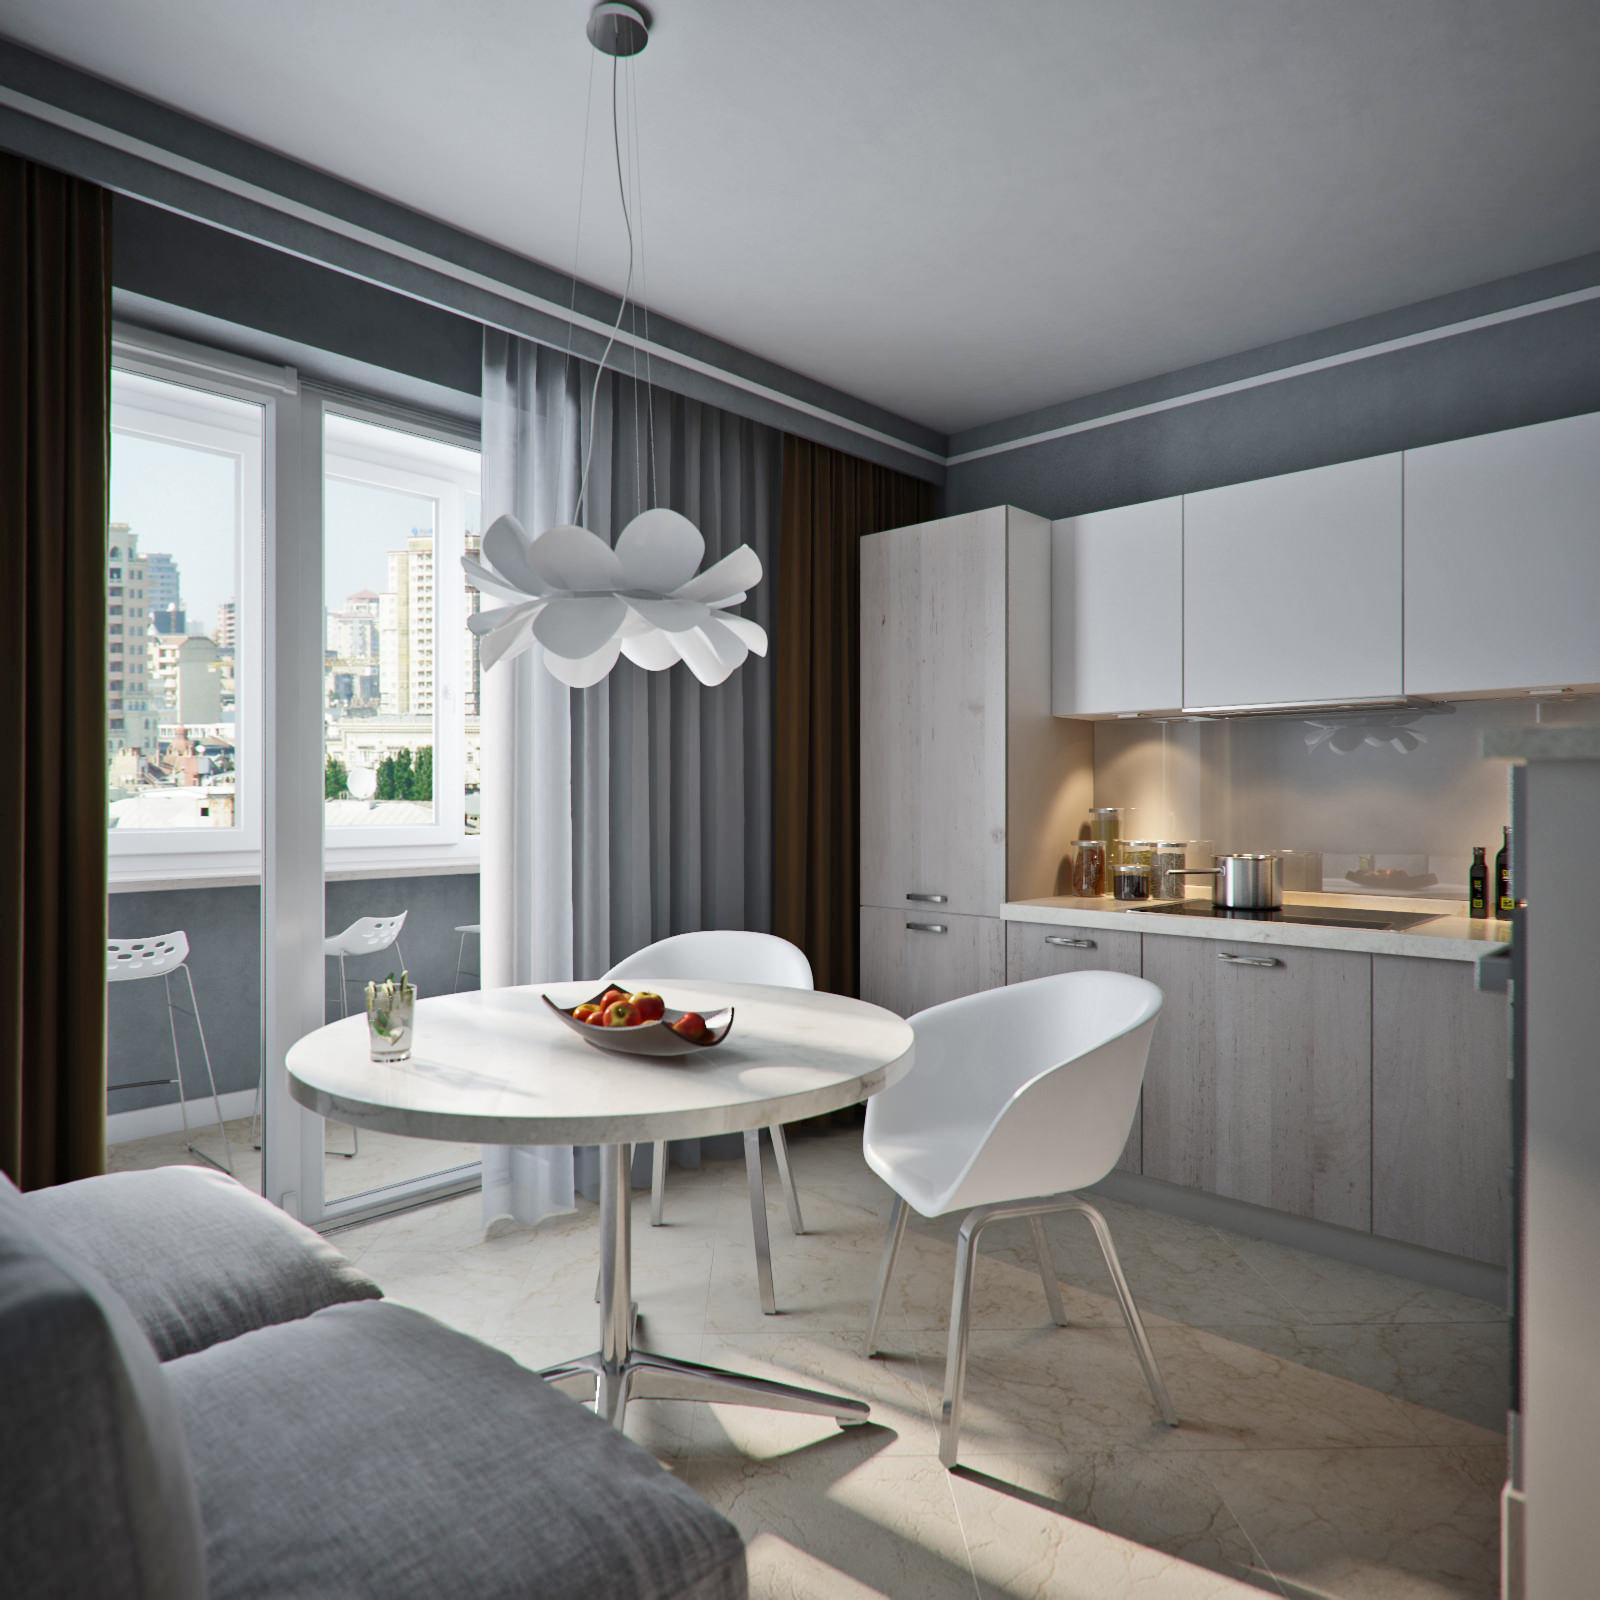 Дизайн однокомнатной квартиры: 40 кв. м